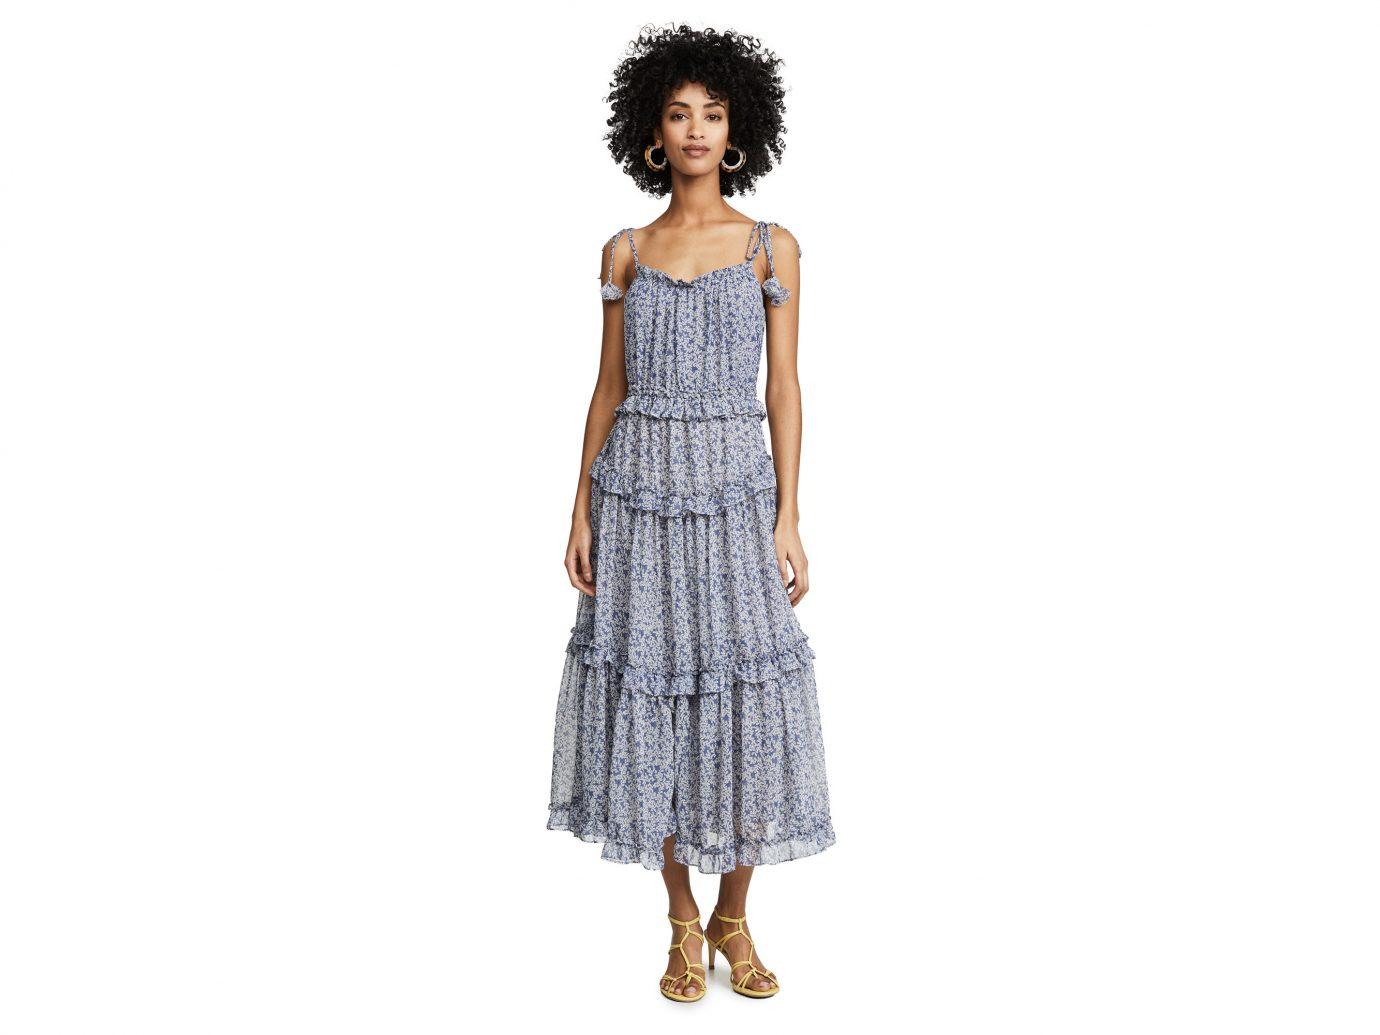 MISA Ryane Dress